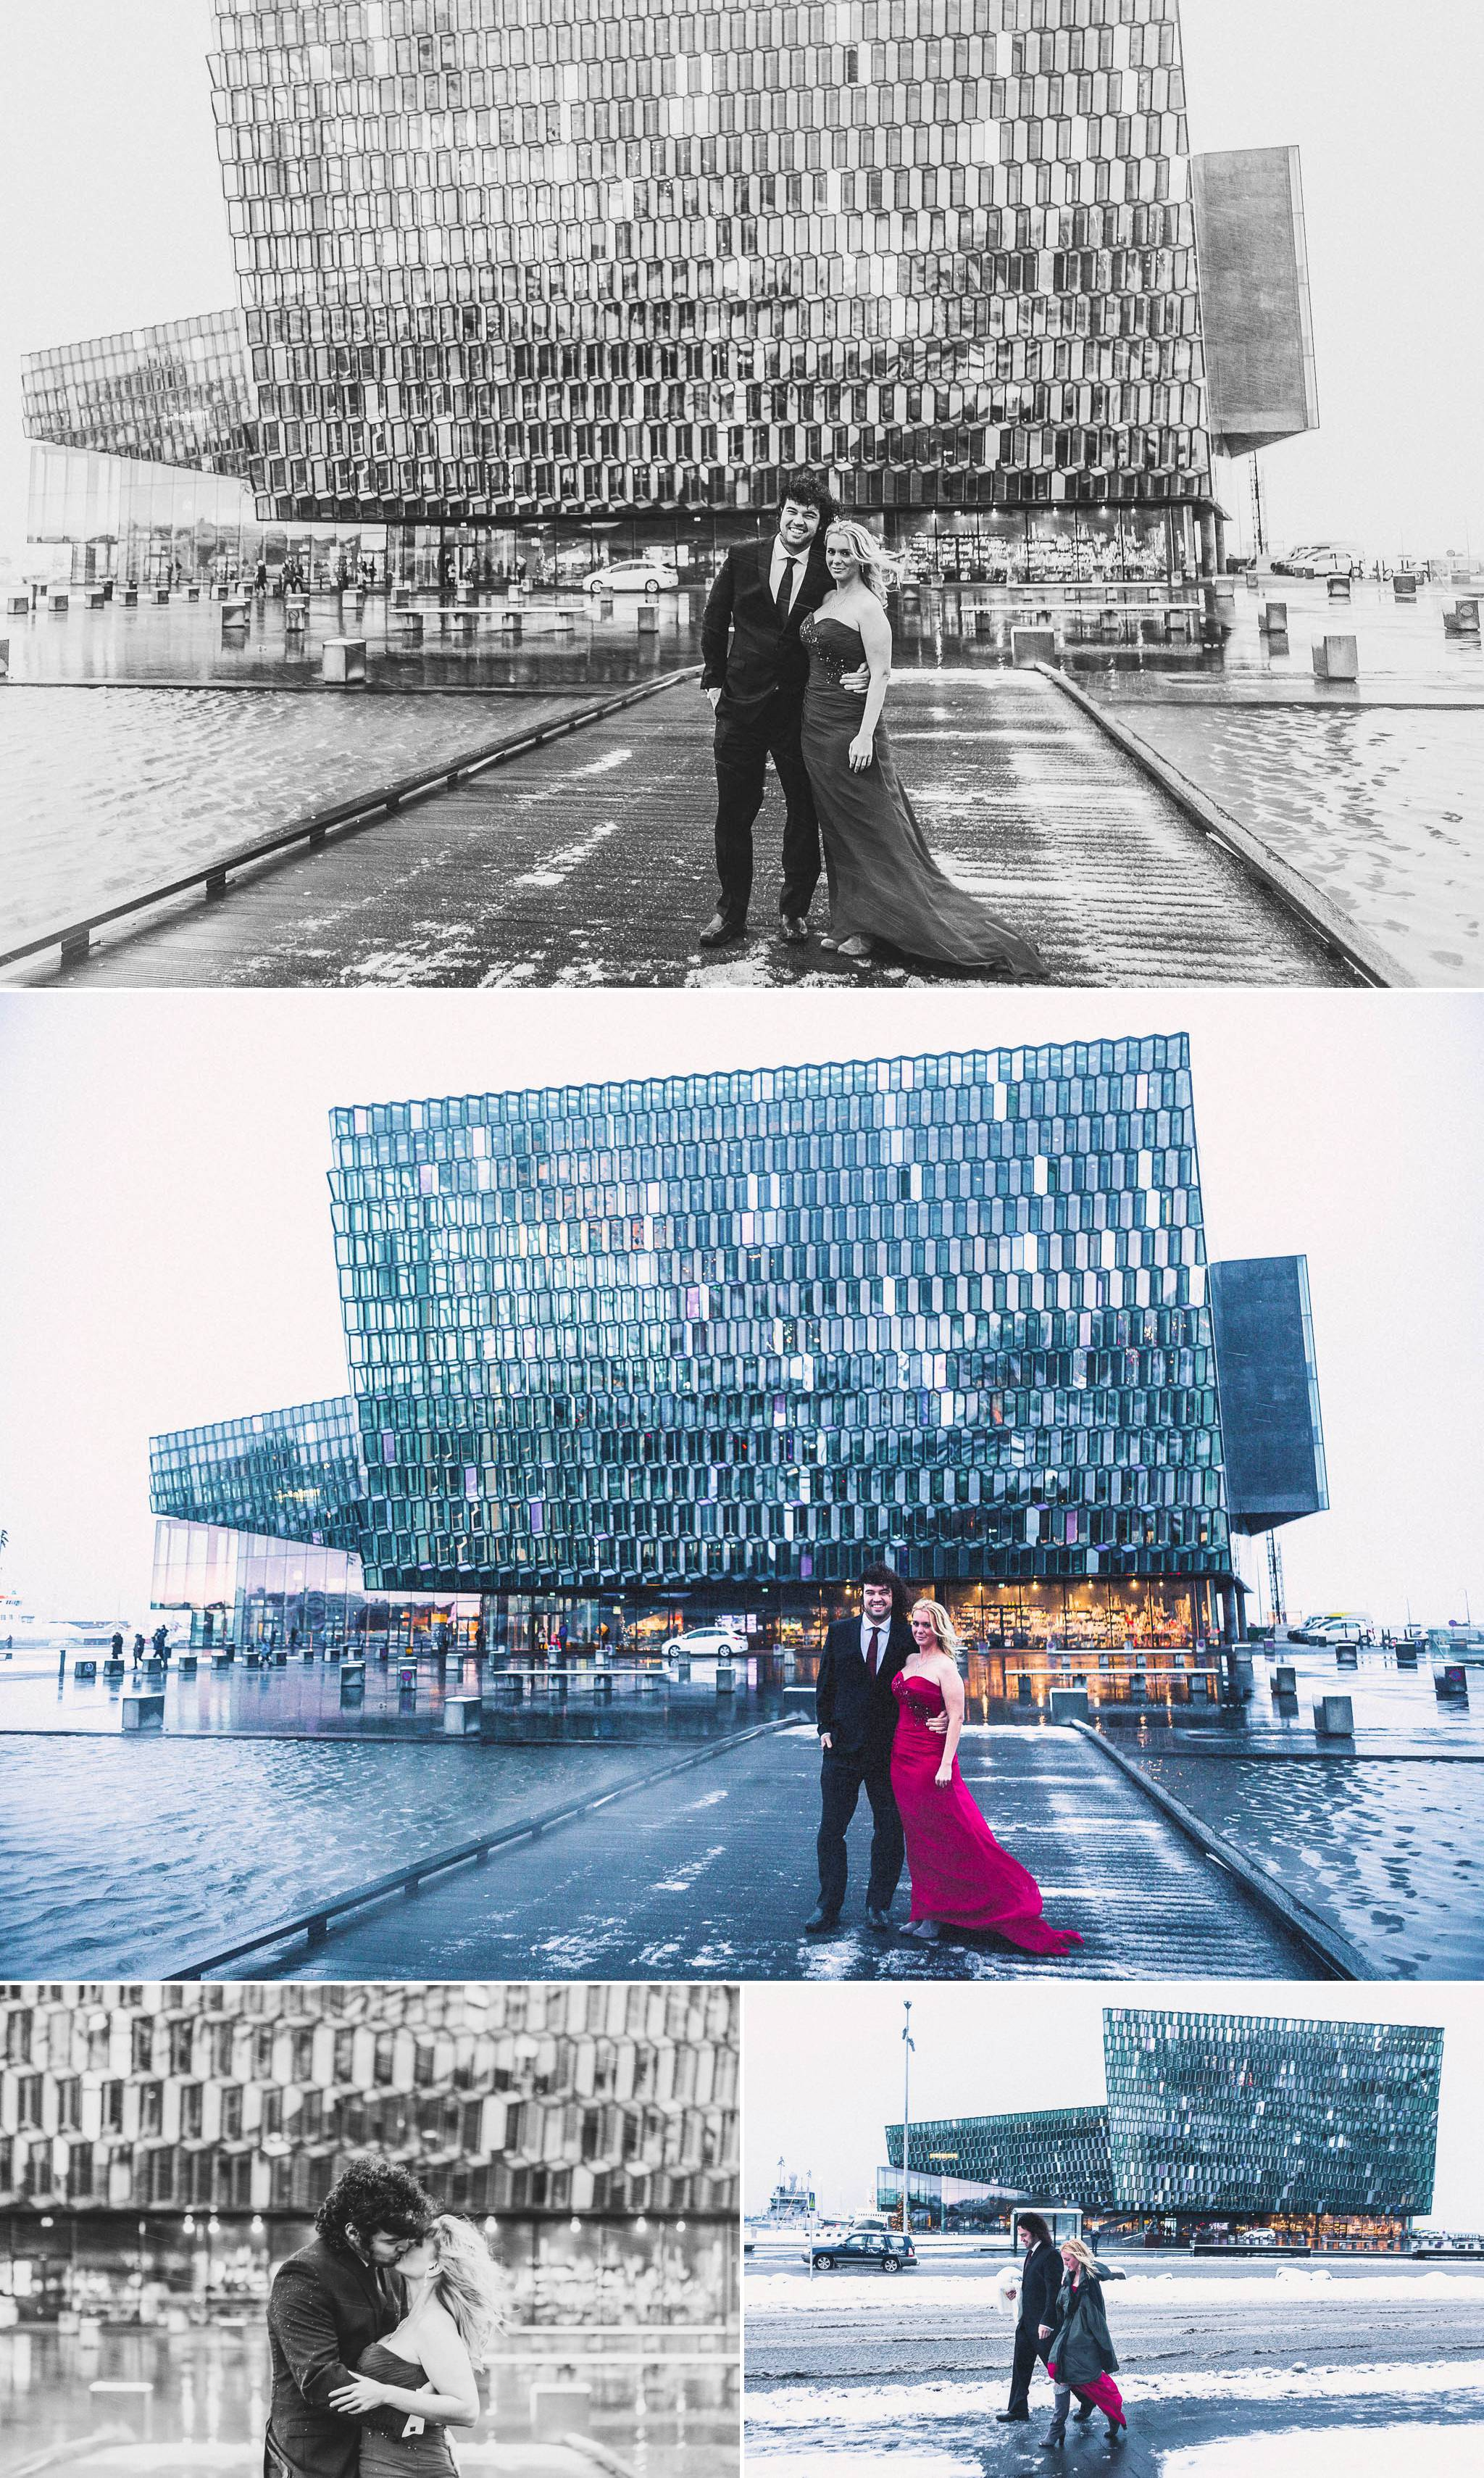 iceland-wedding-photographer 5.jpg